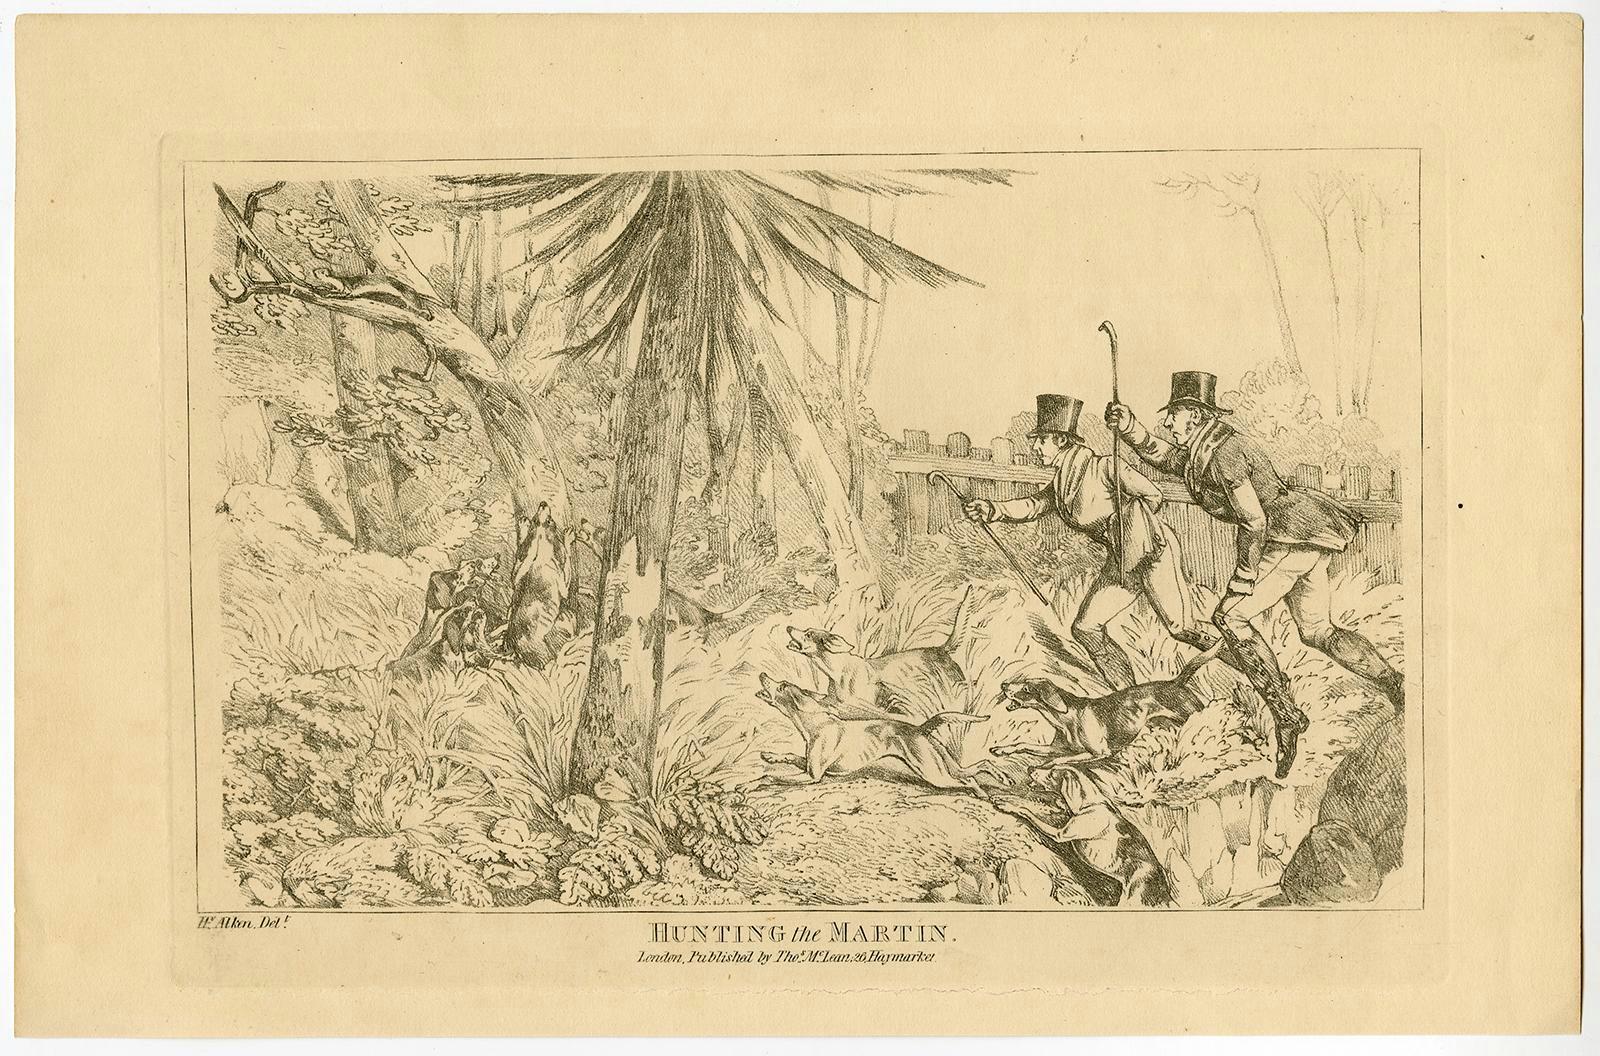 antique print hunting the martin marten dogs alken 1840